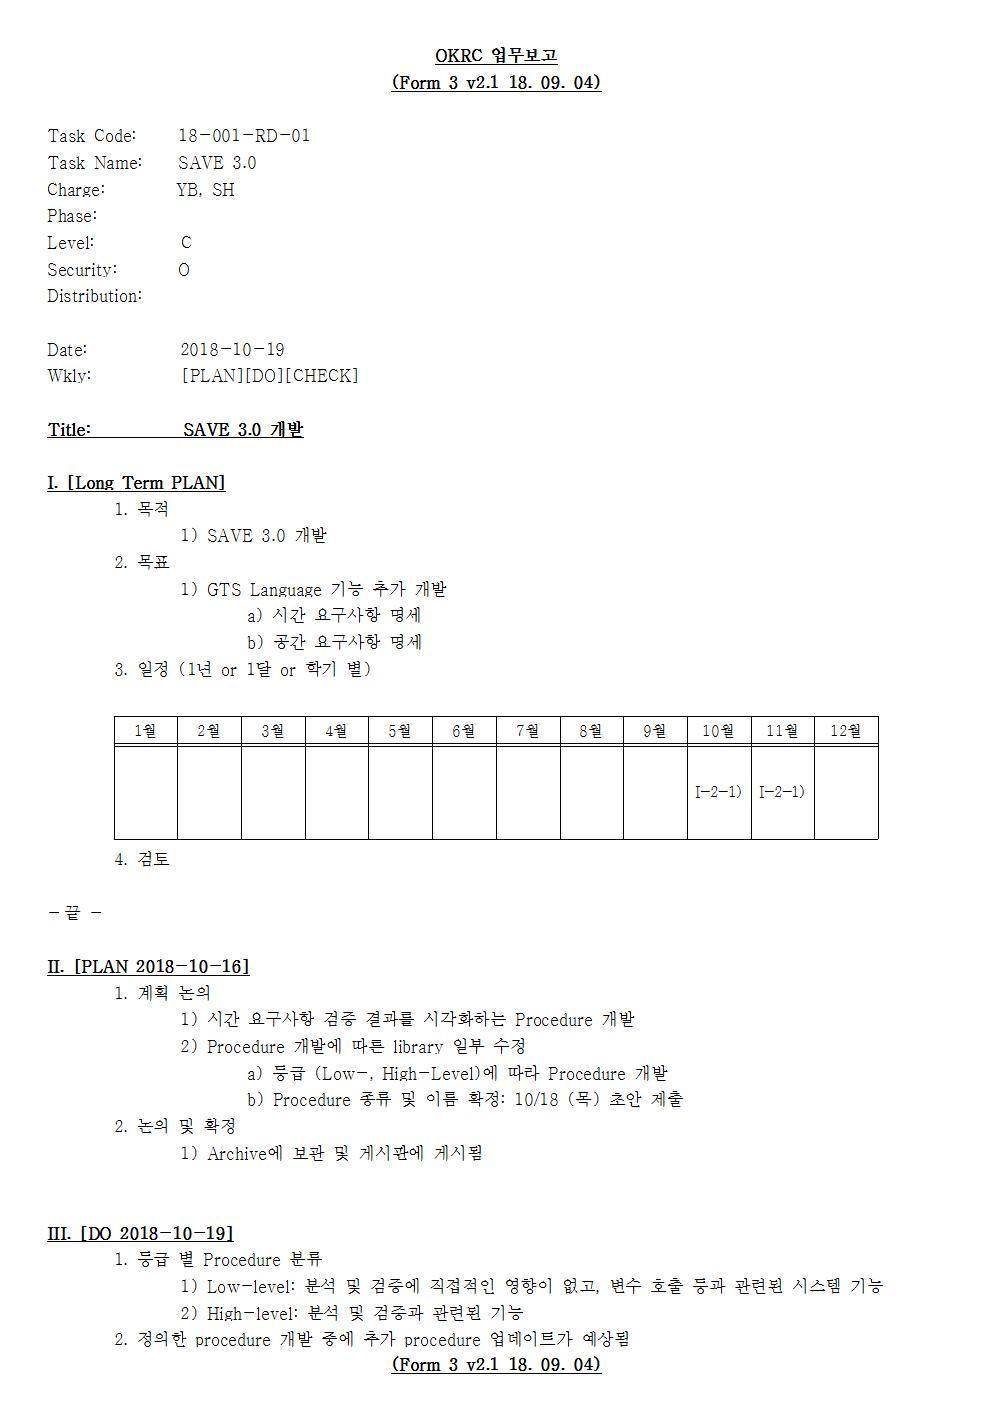 D-[18-001-RD-01]-[SAVE 3.0]-[2018-10-19][SH]001.jpg